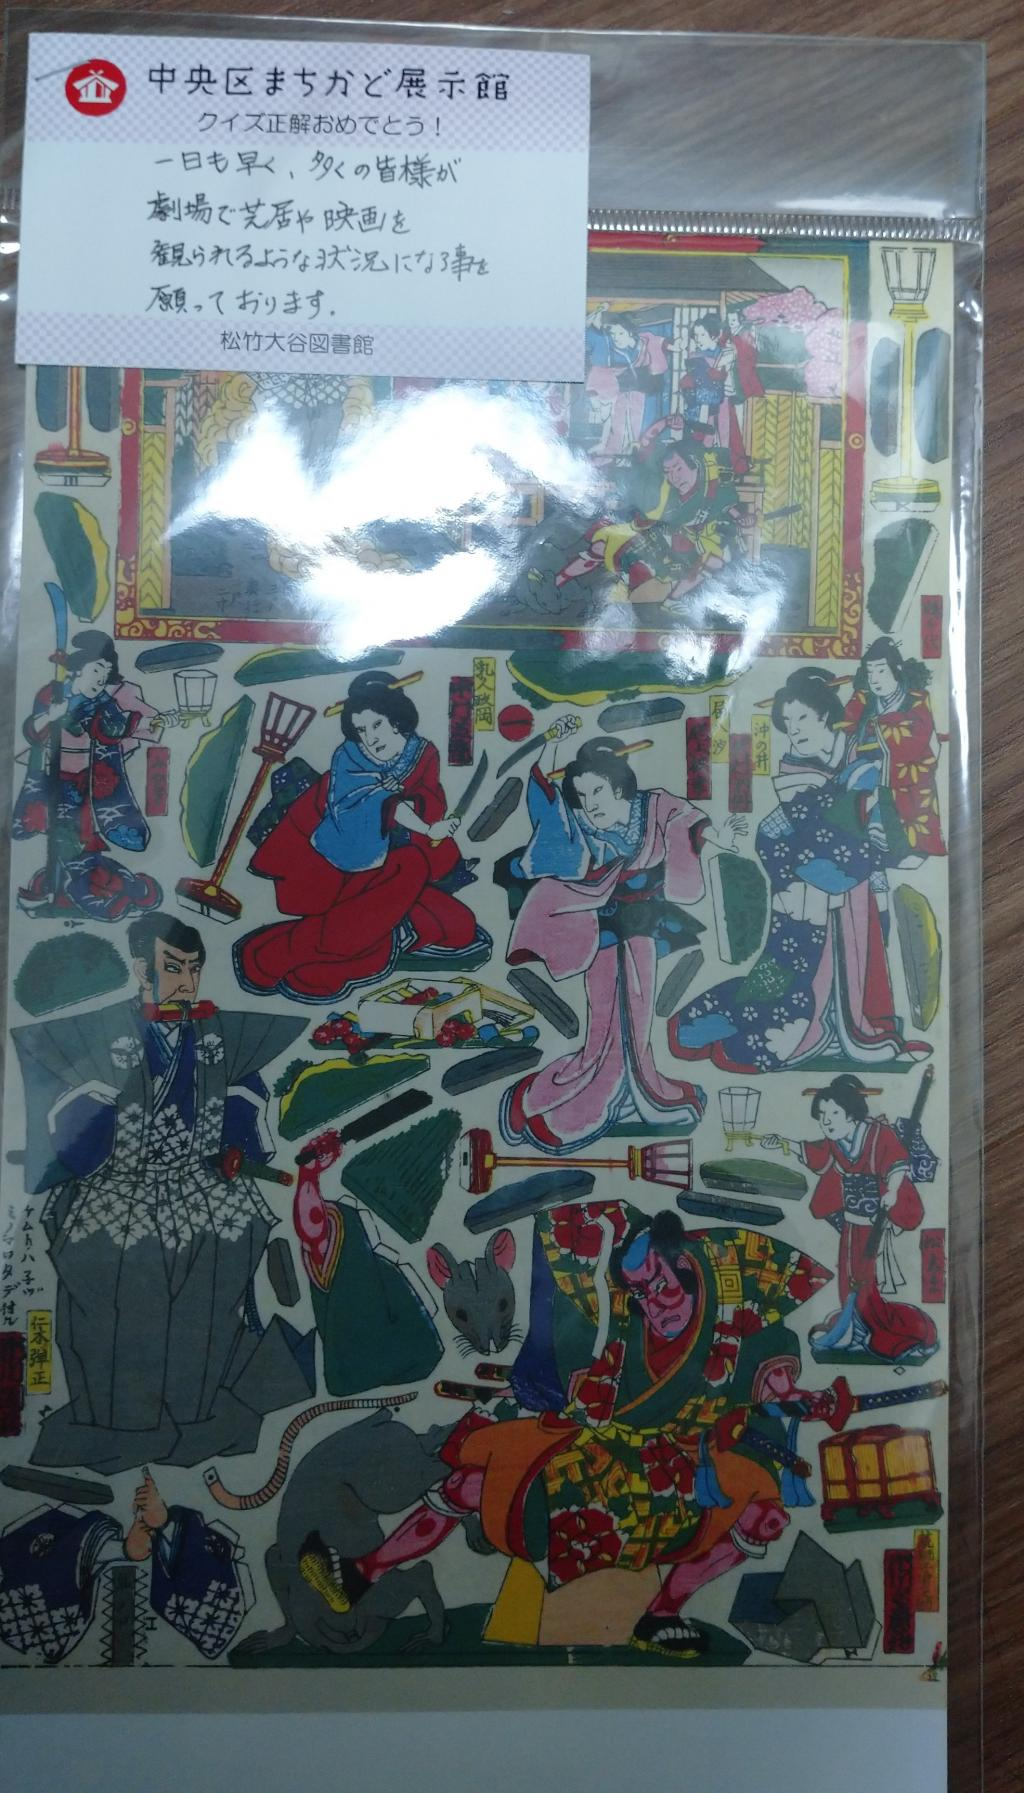 "2: Present of book jacket ""Chuo-ku town corner pavilion period-limited quiz"" of ""Shochiku Otani library""♪"